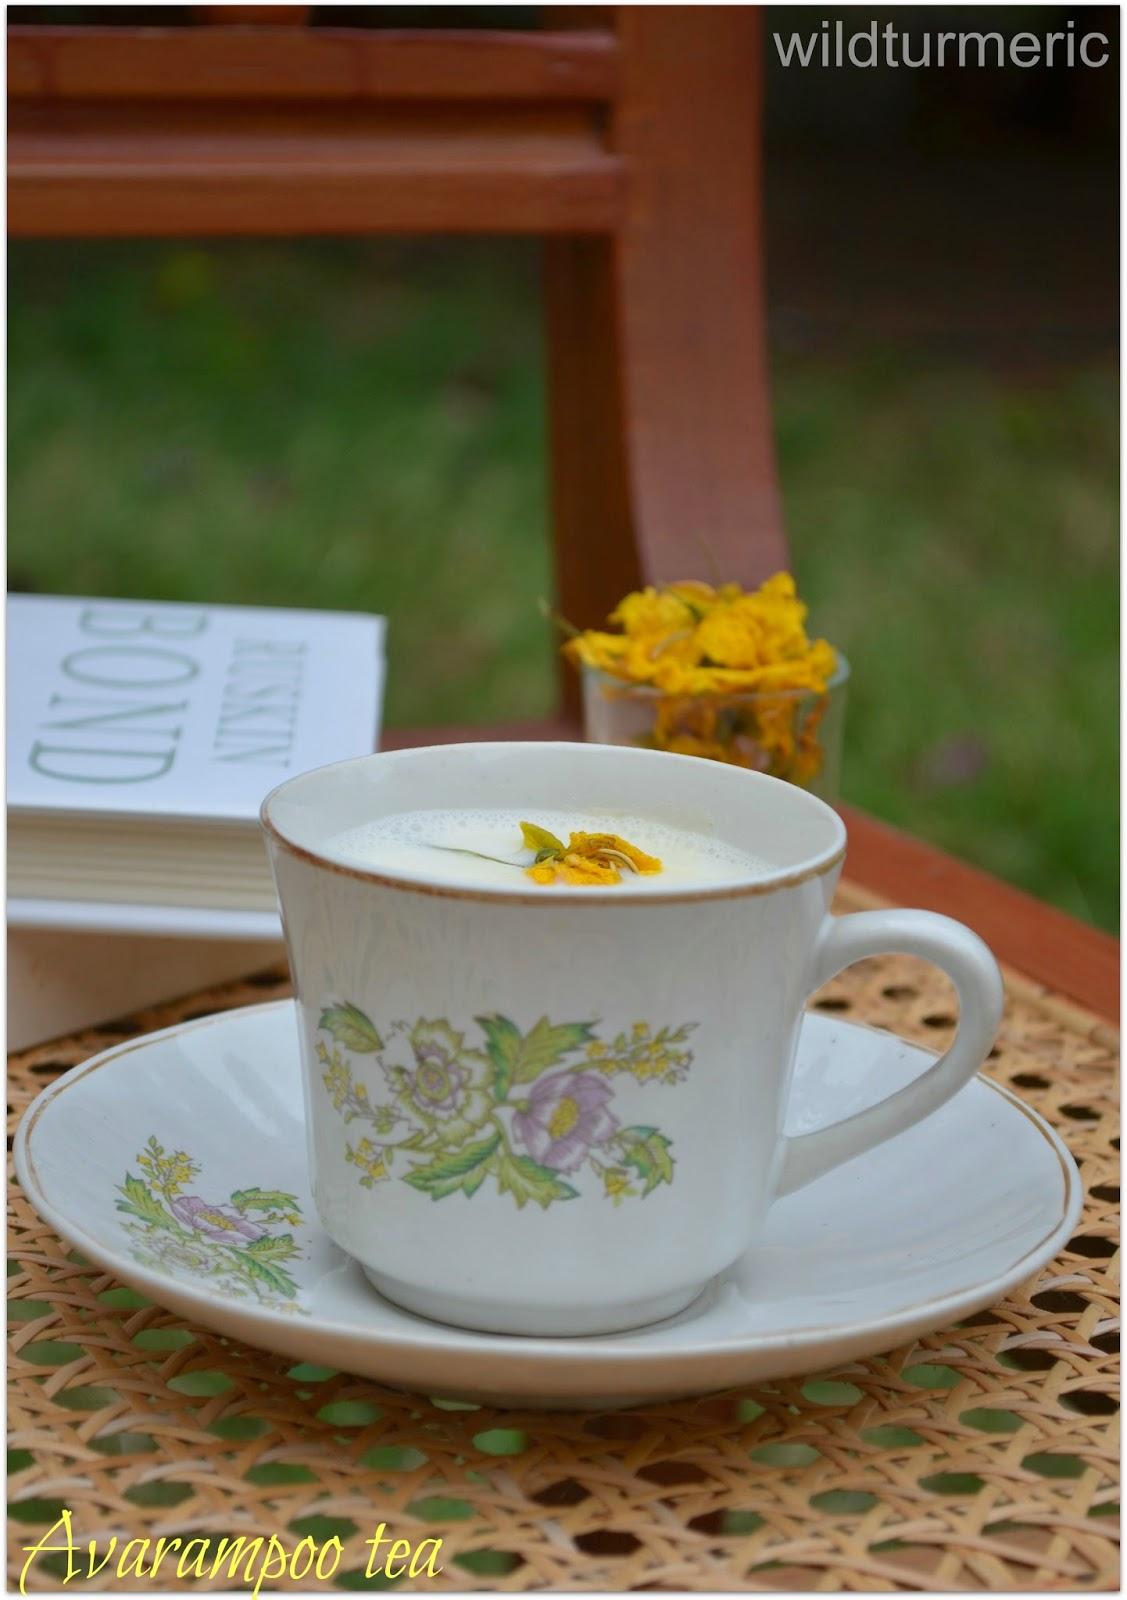 Avaram Poo Flower Tea Recipe + Health Benefits